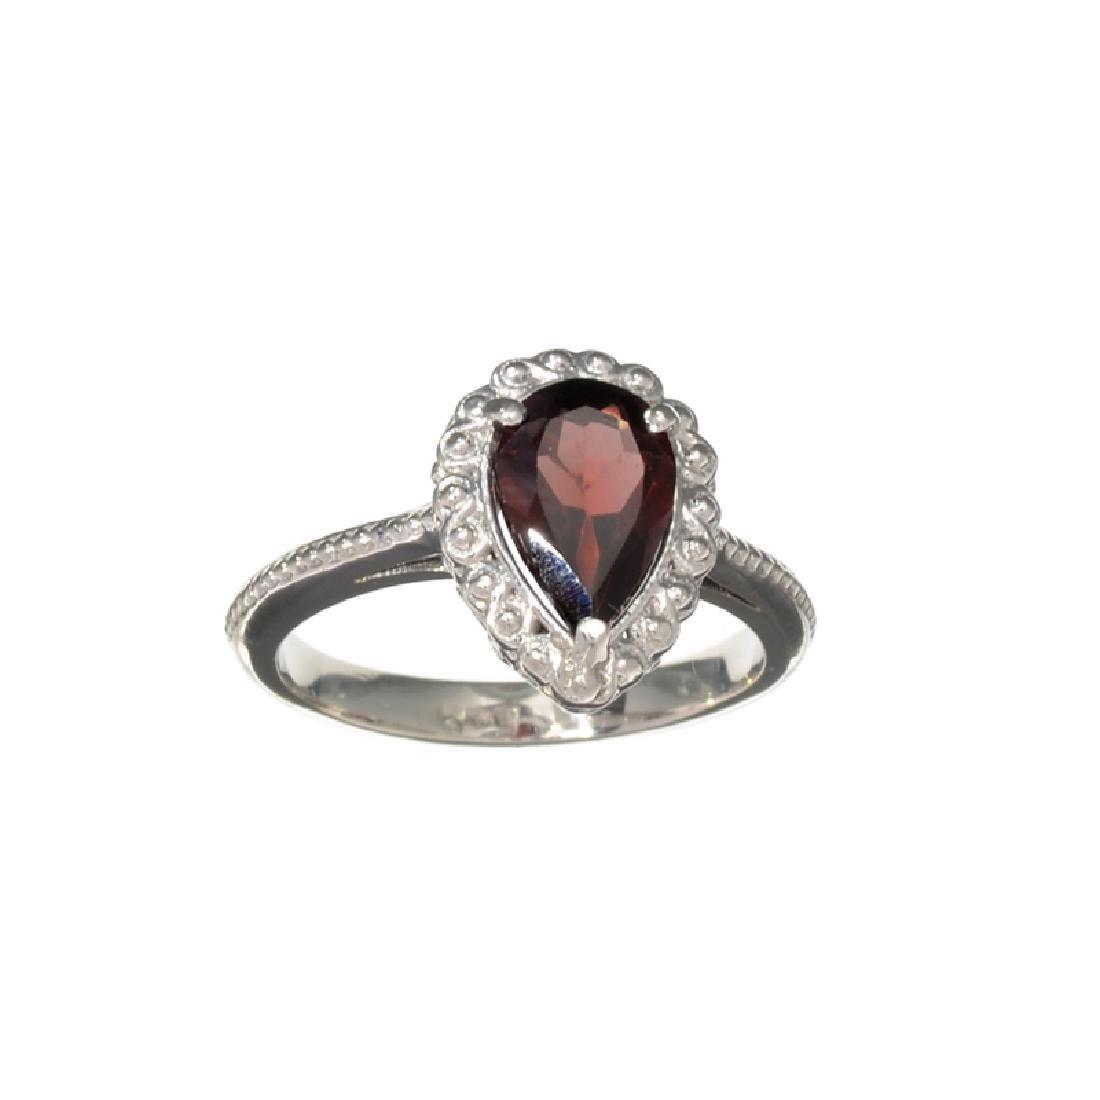 APP: 0.3k Fine Jewelry 2.27CT Pear Cut Almandite Garnet